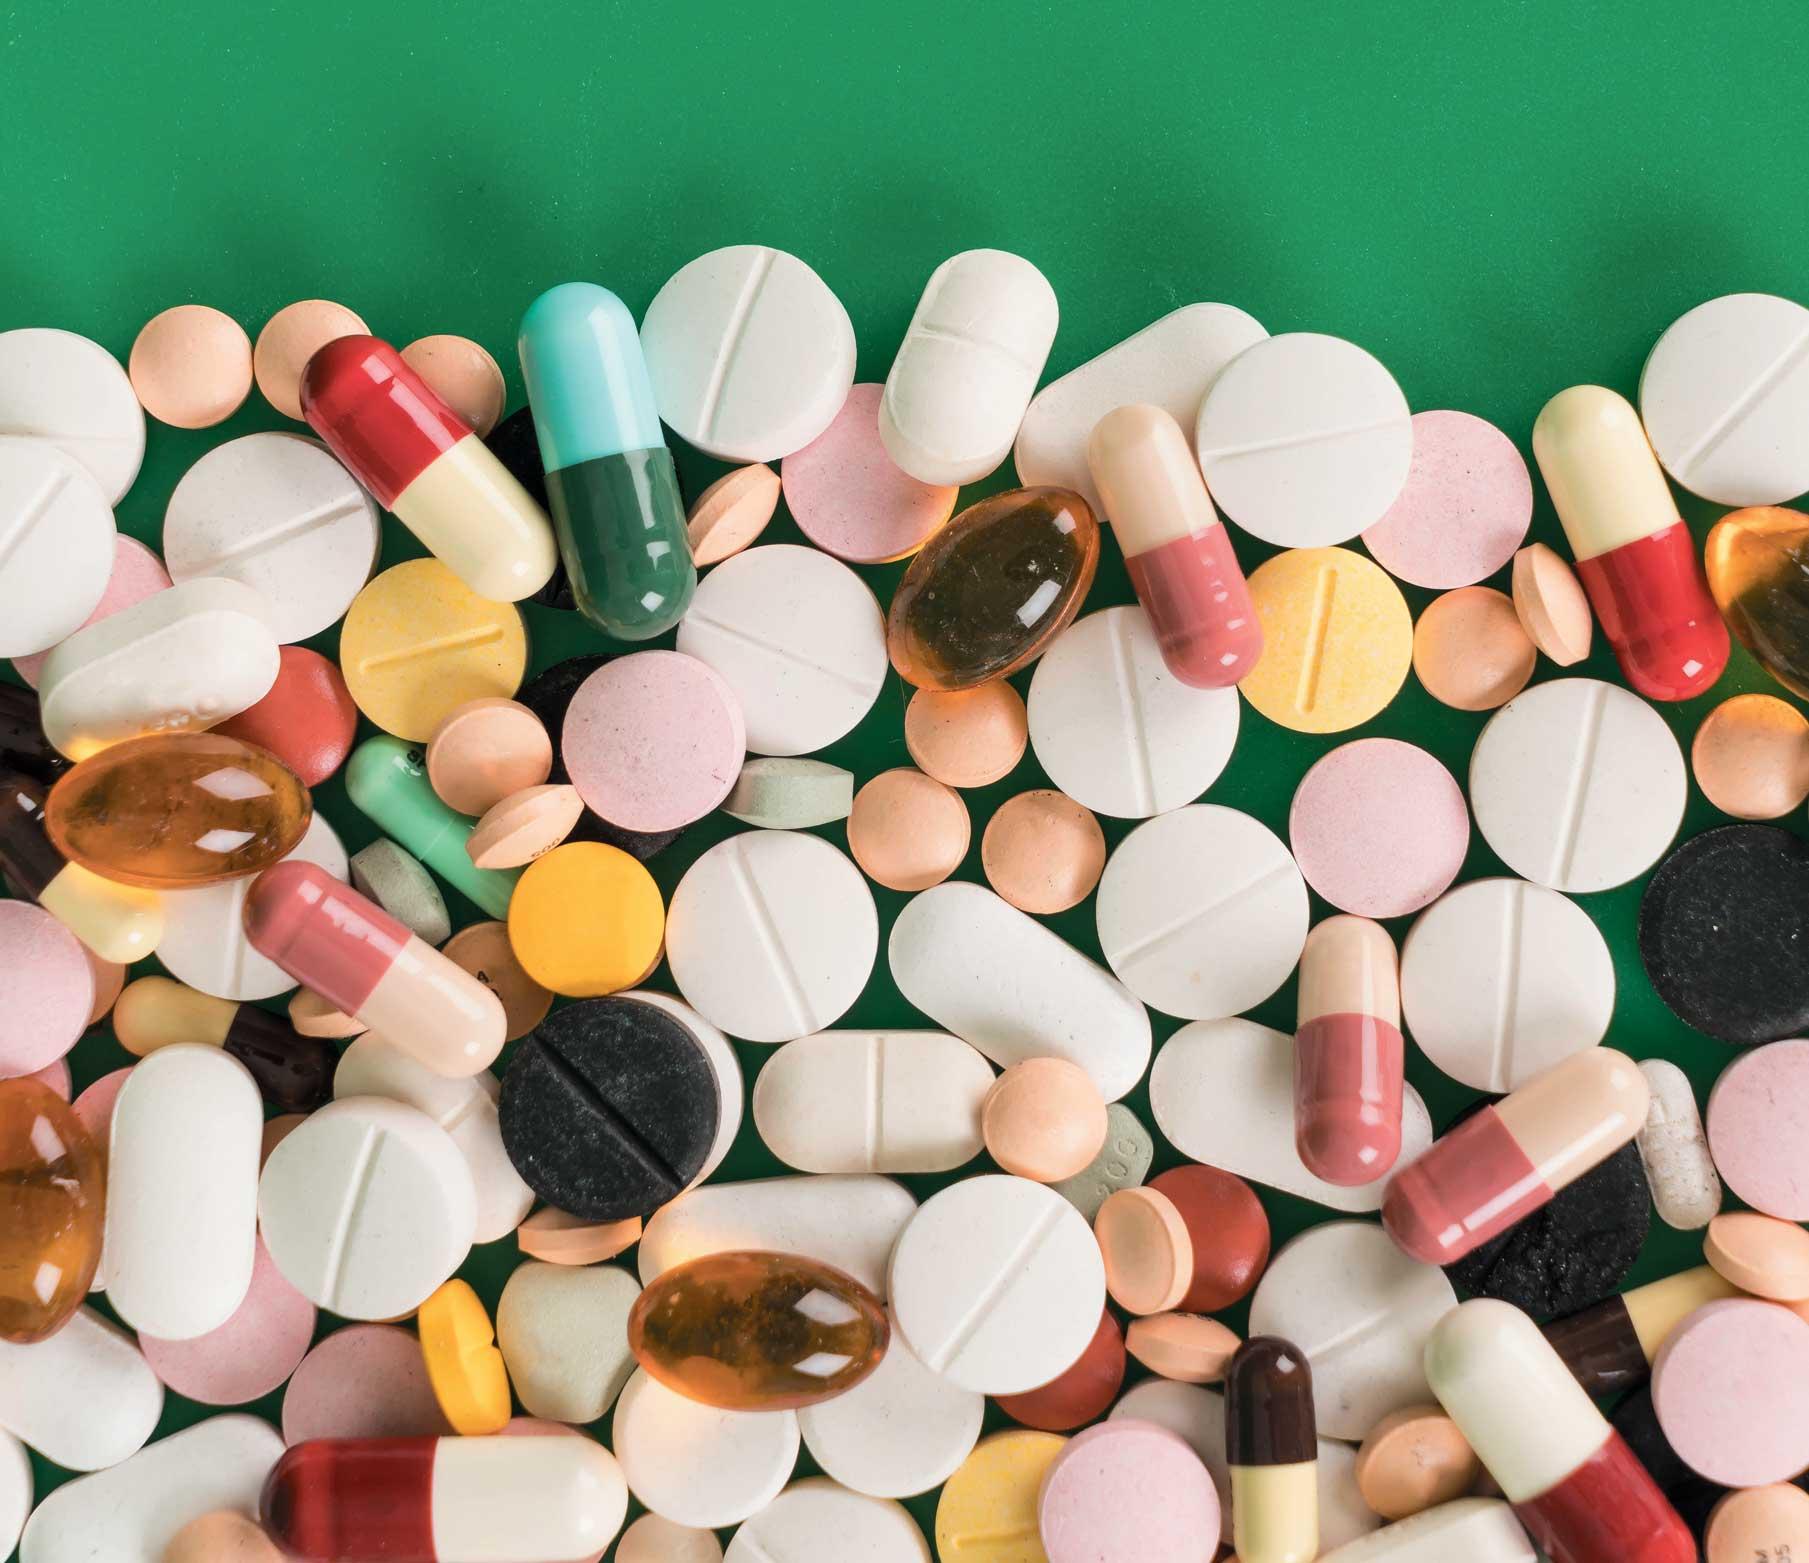 Baptist Health South Florida enters generic drug business